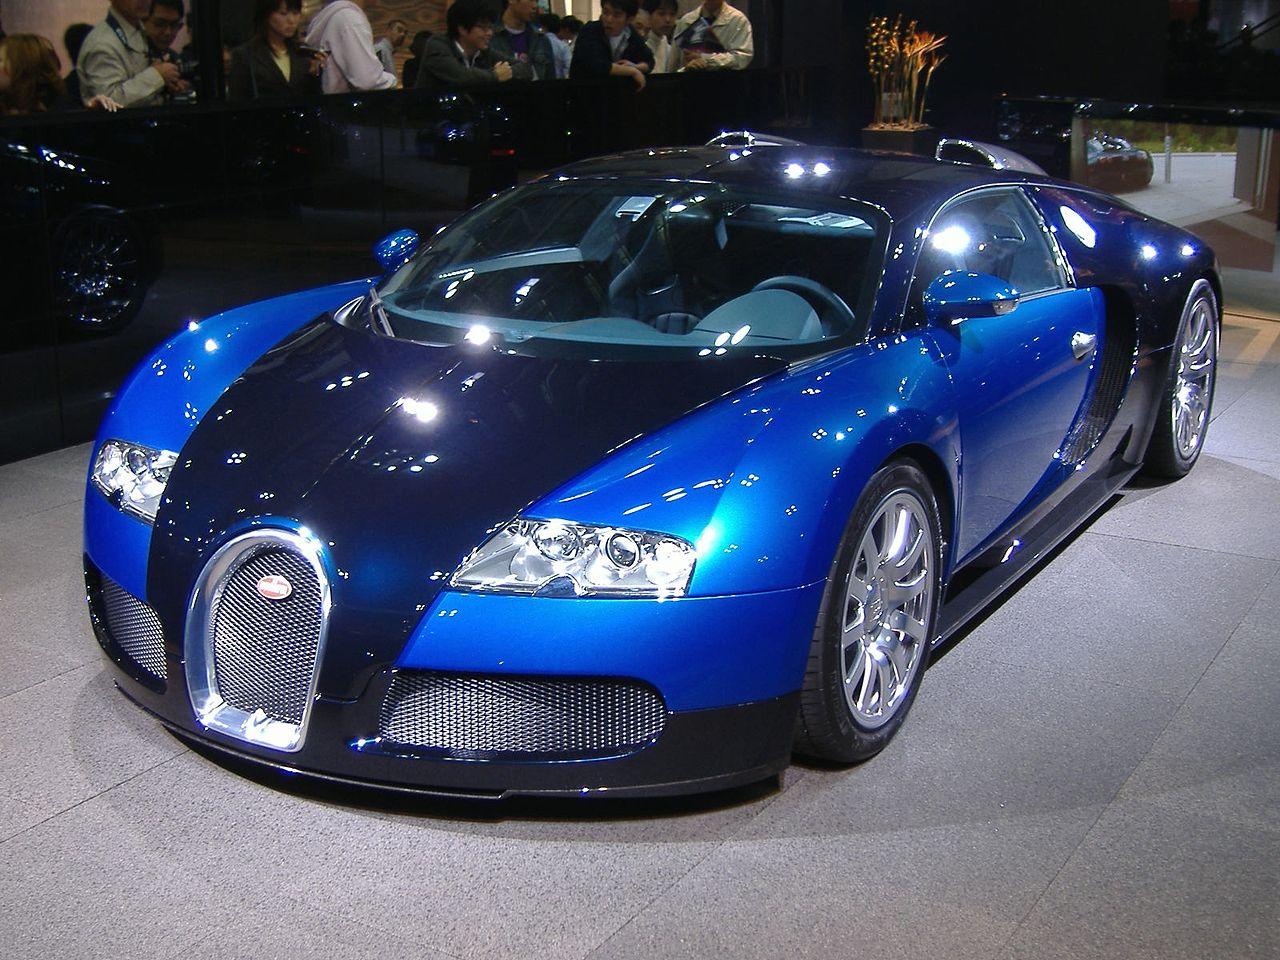 1280px-Bugatti_veyron_in_Tokyo